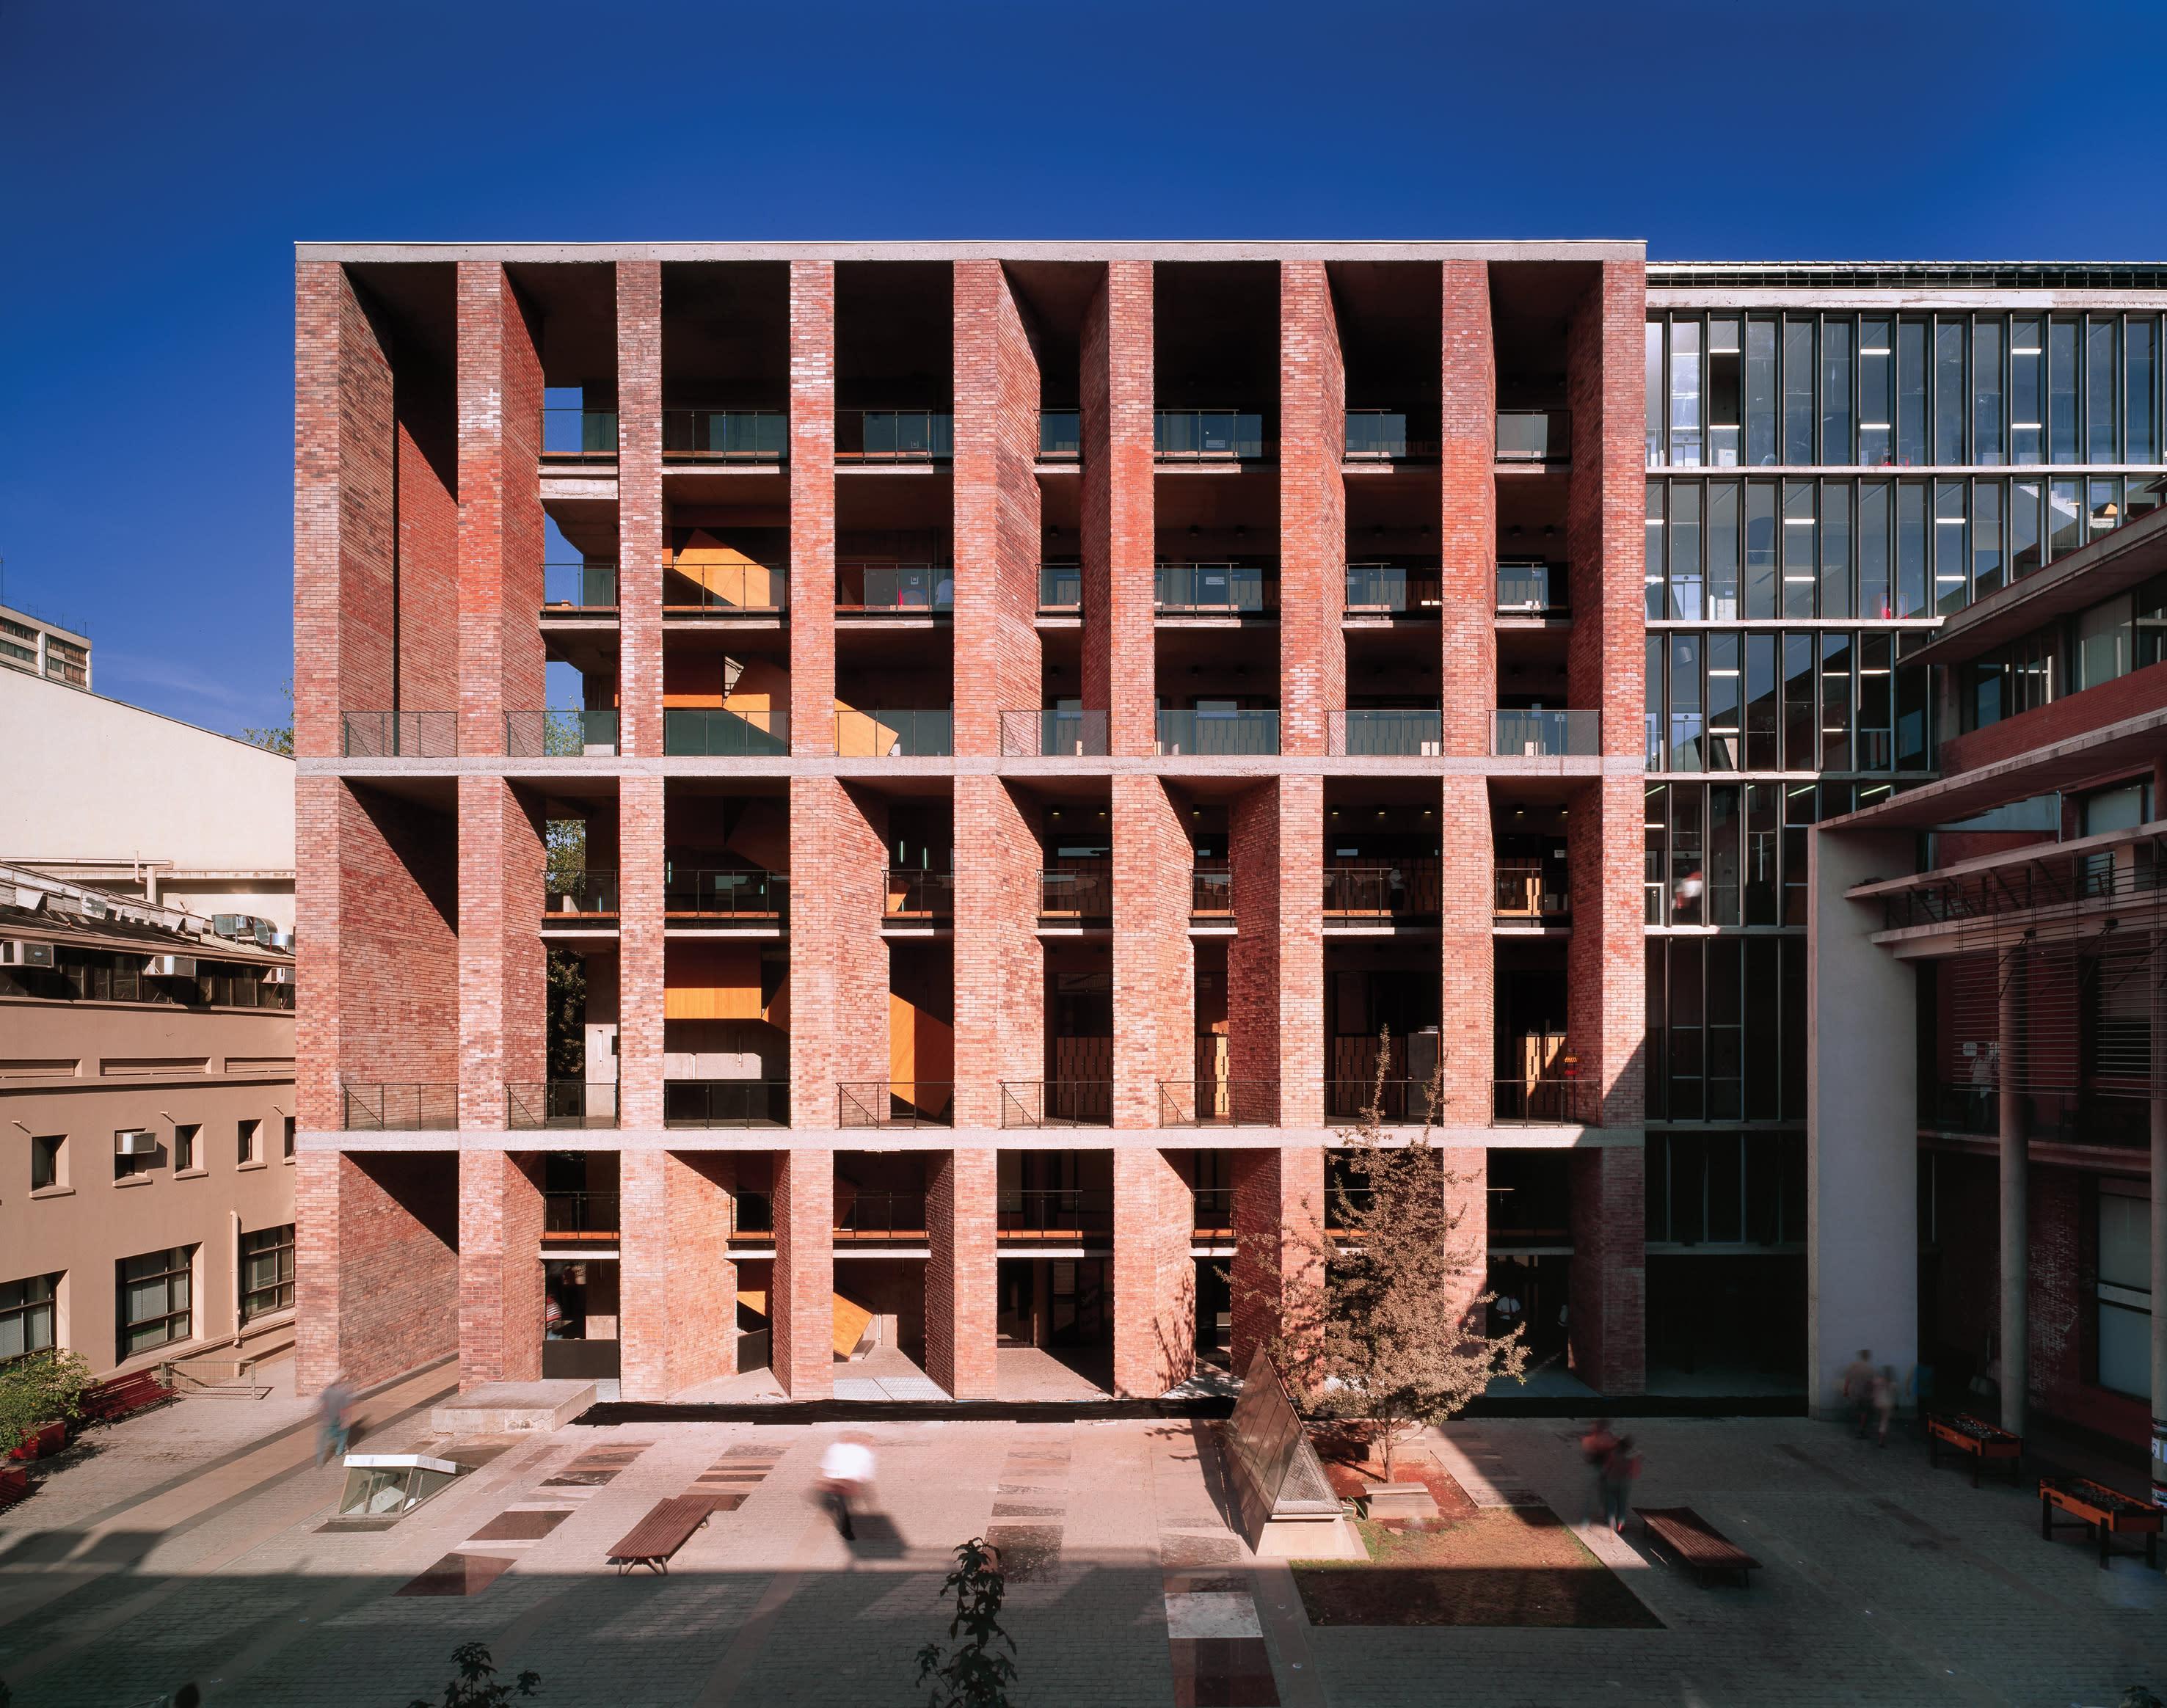 Chilean architect Alejandro Aravena, center, has won the 2016 Pritzker Prize. His UC Innovation Center at the San Joaquín Campus, Universidad Católica de Chile Santiago (left) and Constitución Cultural Center (right) from 2014, also in Chile, represent recent built work...